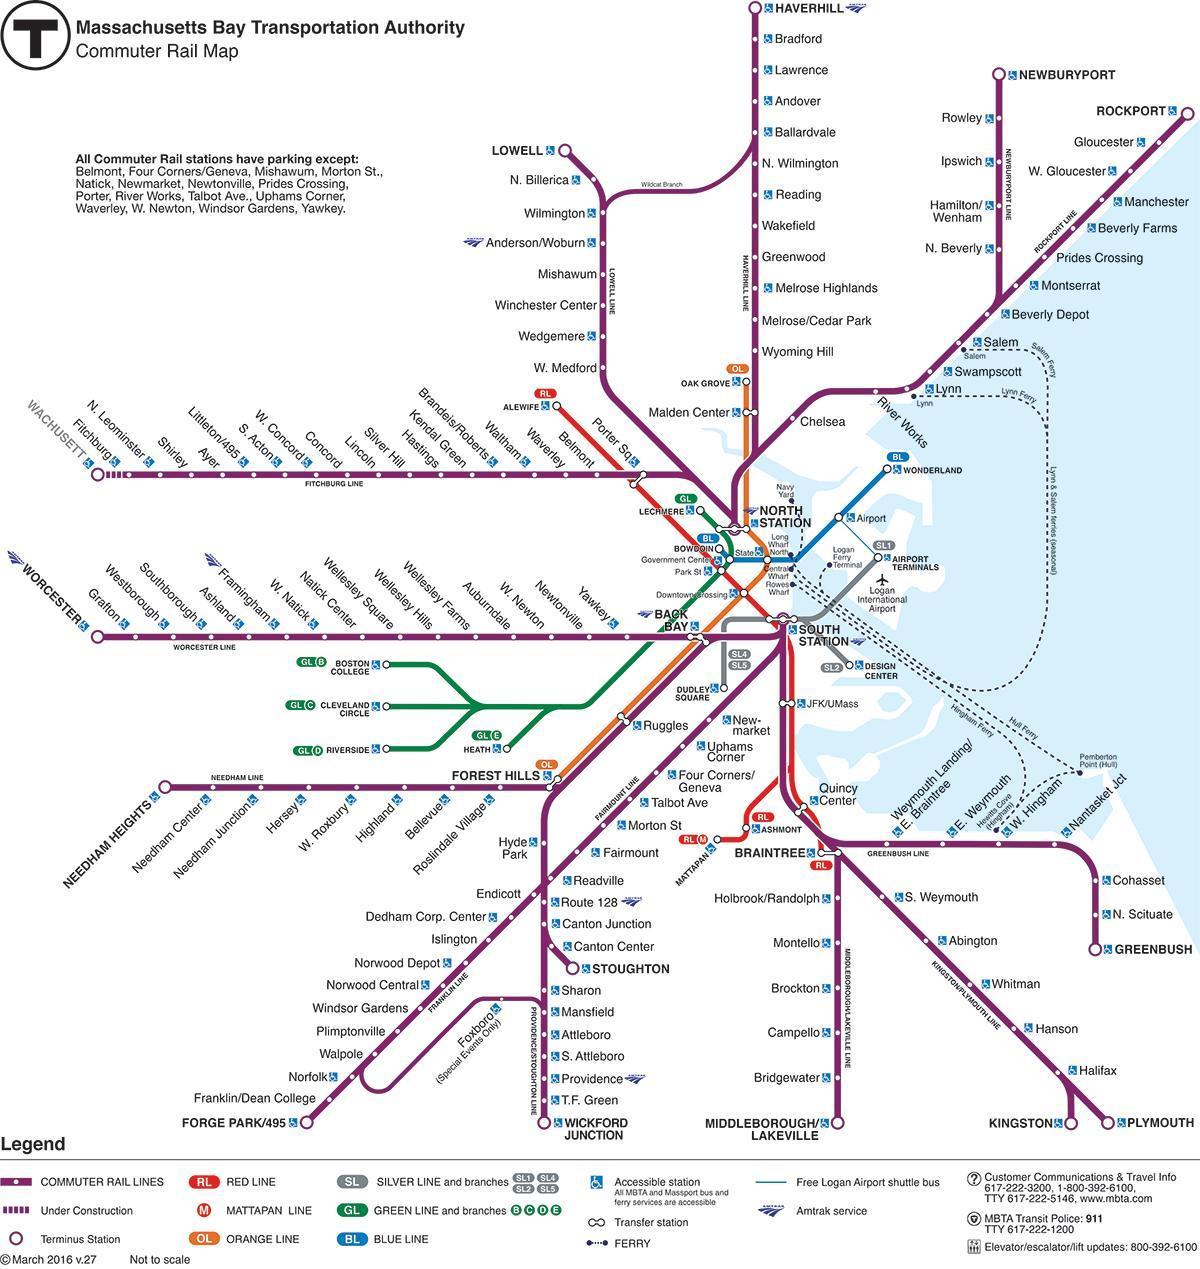 Boston train map Boston train station map United States of America